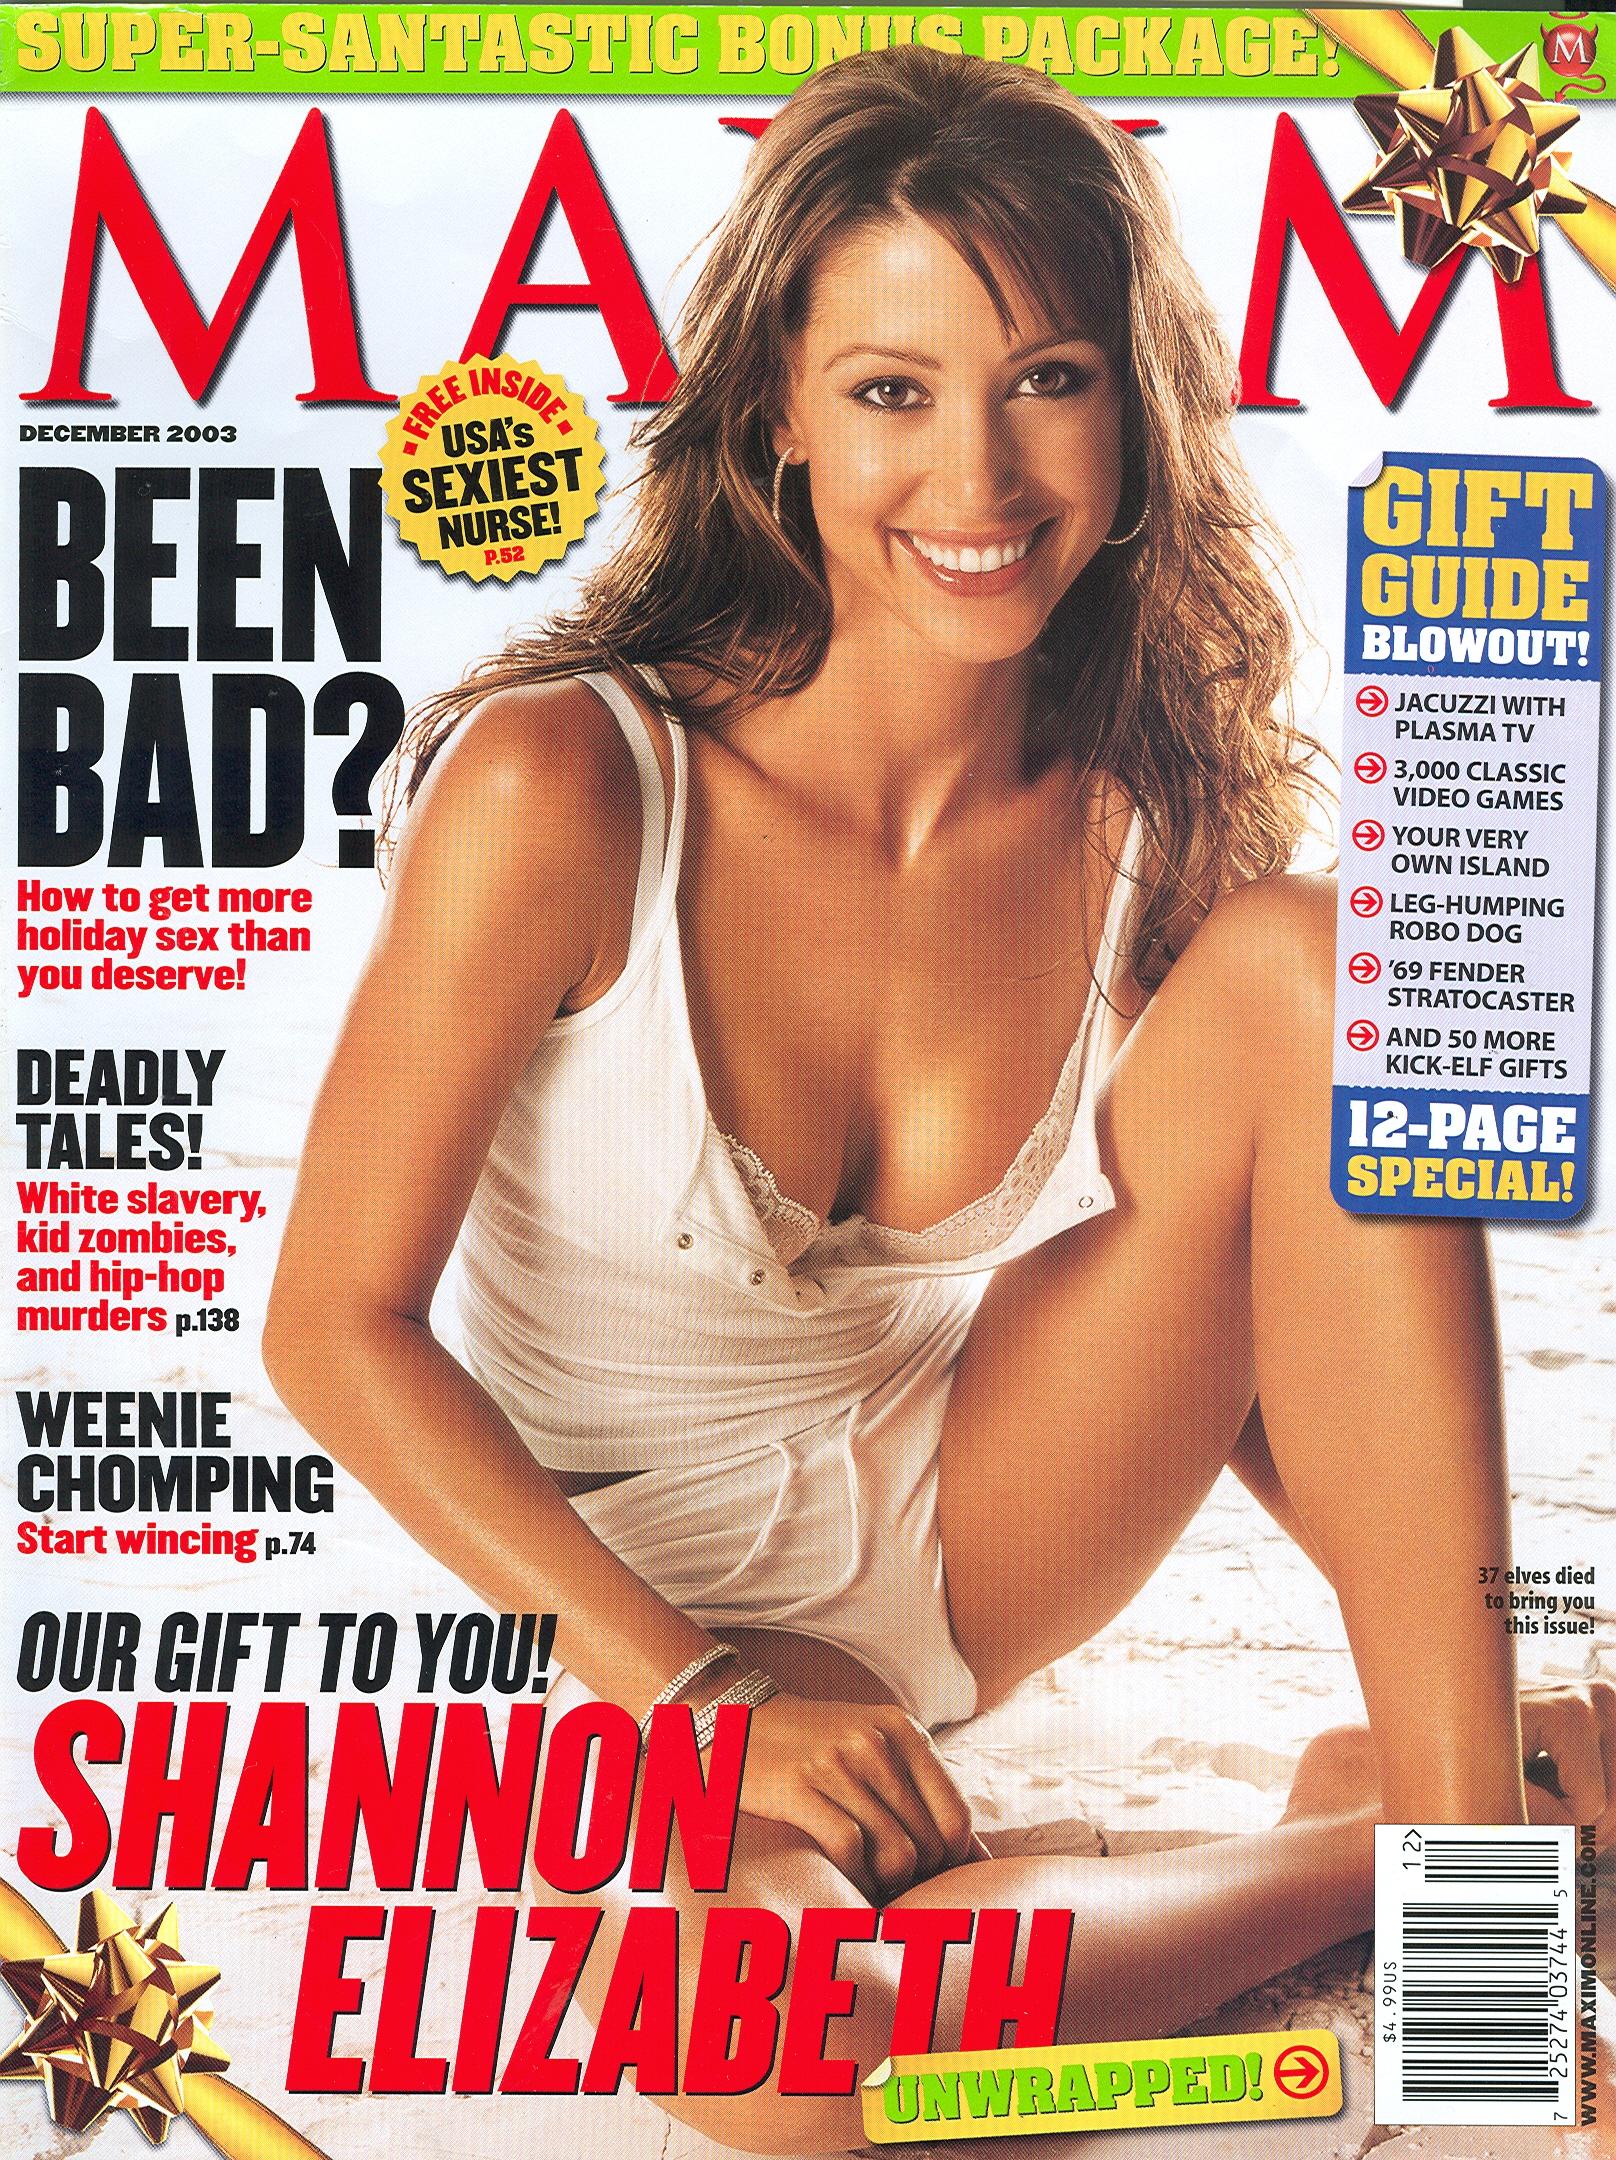 SE_Maxim 2003_1.jpg